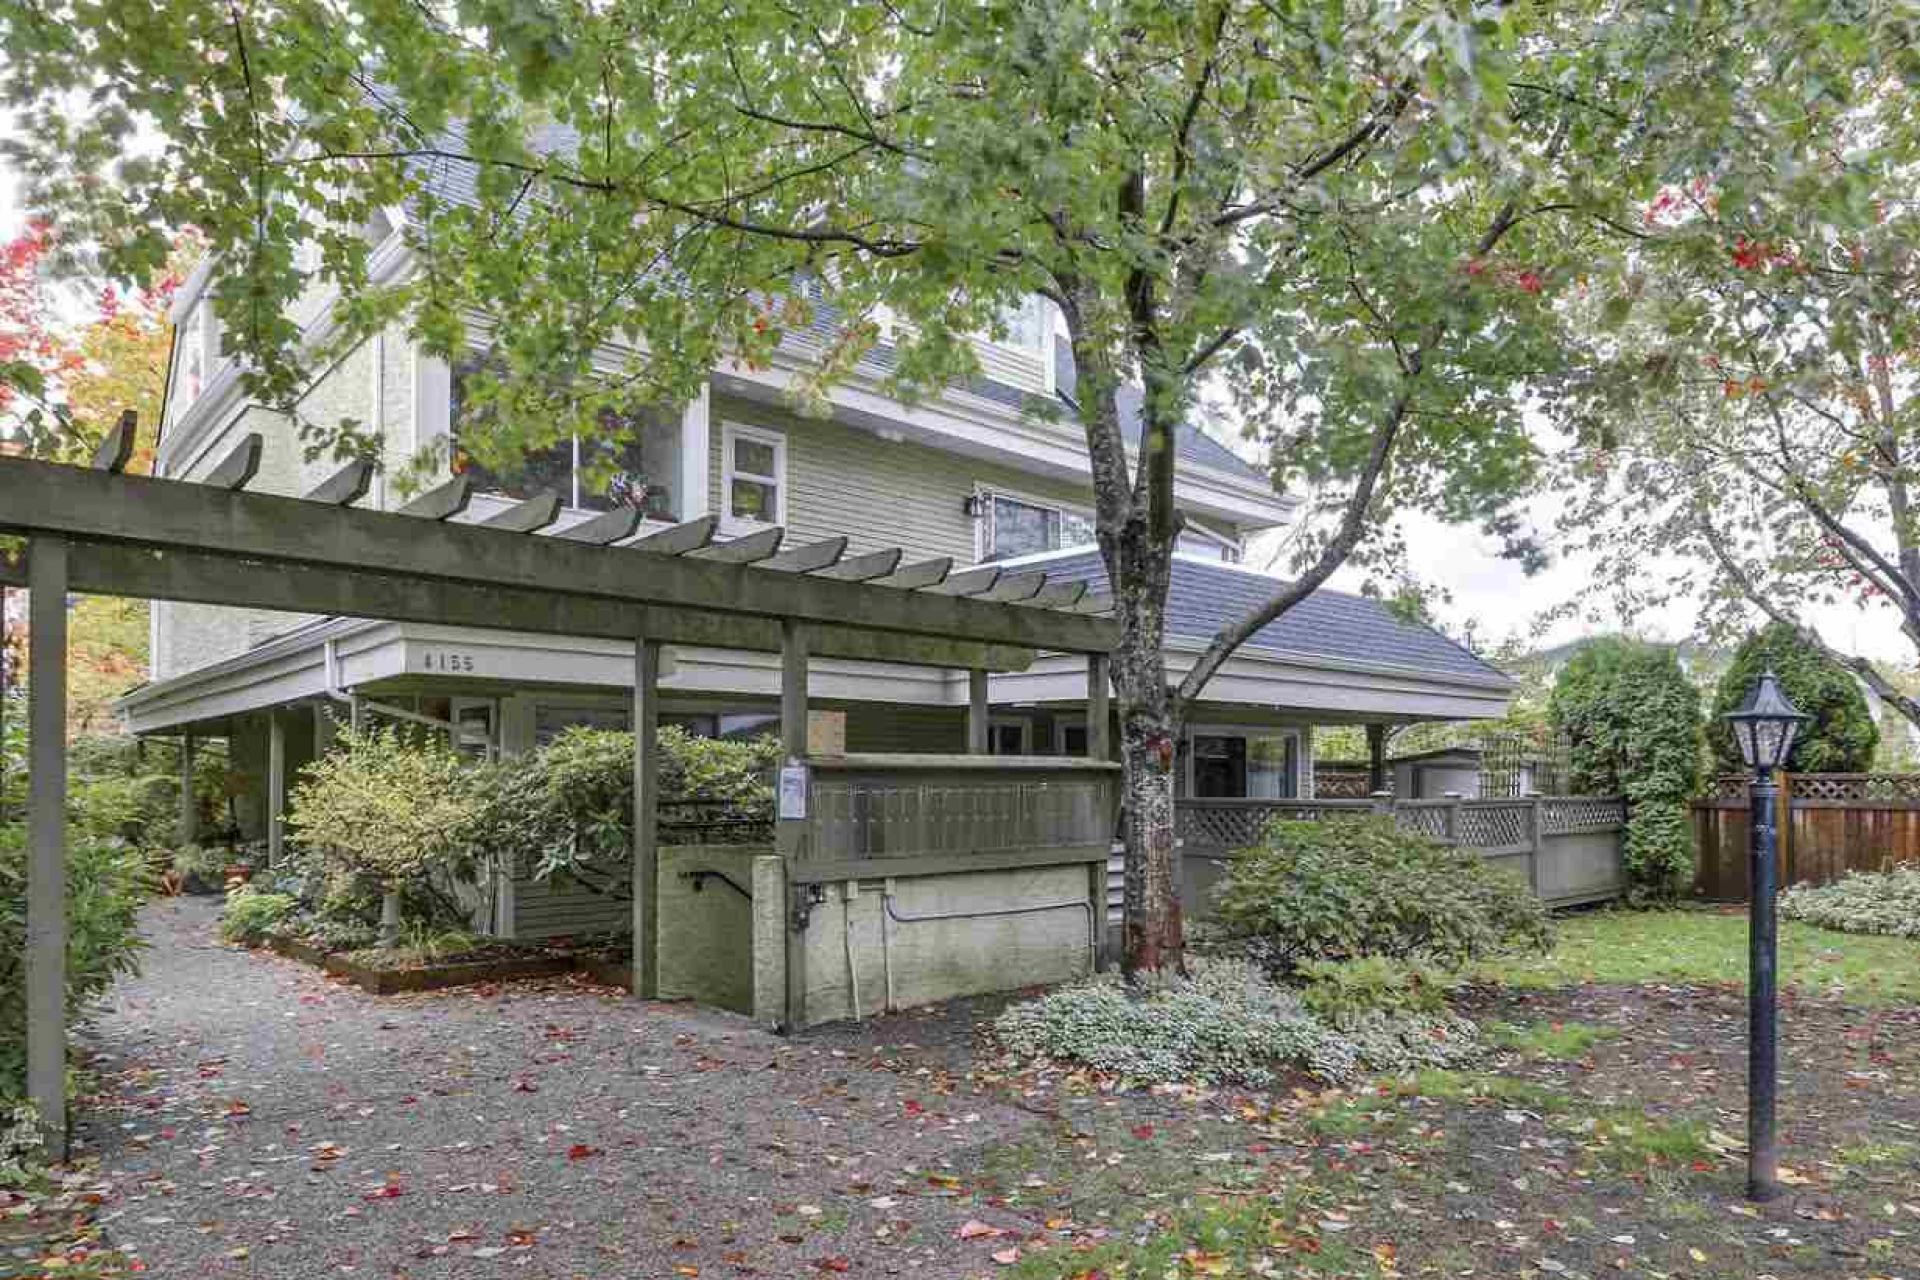 12 - 4155 Sophia Street, Main, Vancouver East